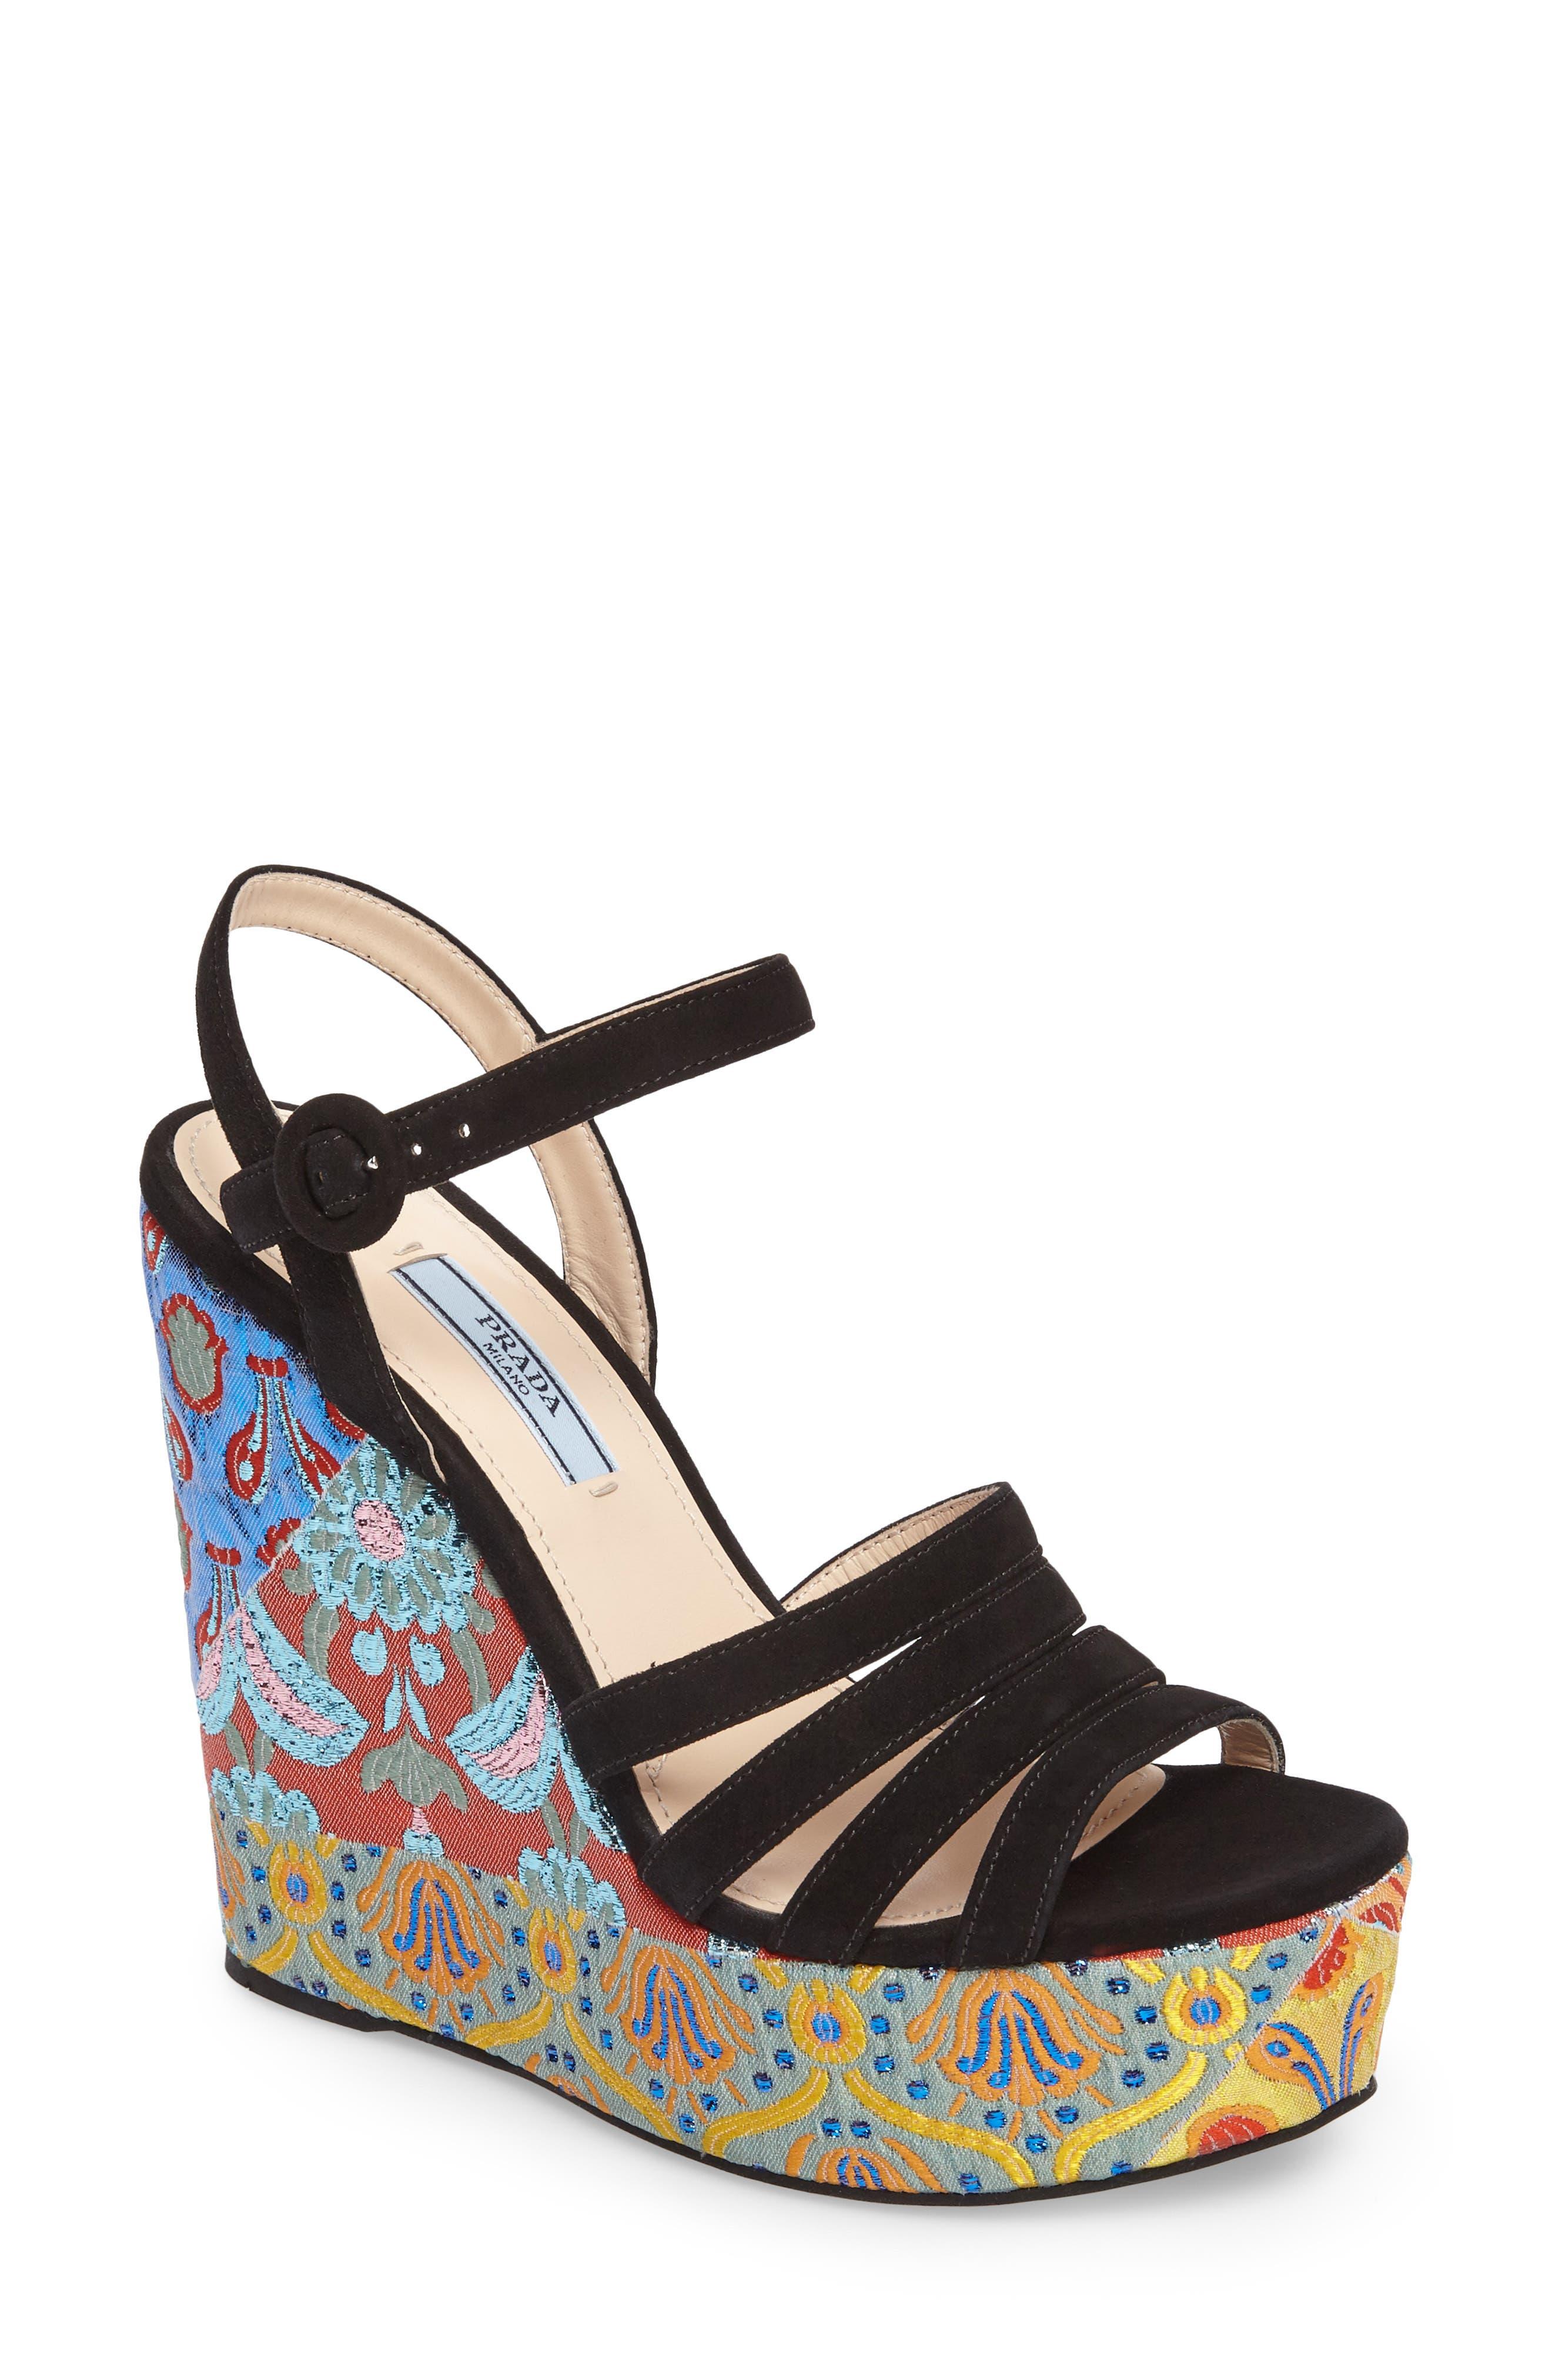 Floral Platform Wedge Sandal,                             Main thumbnail 1, color,                             002